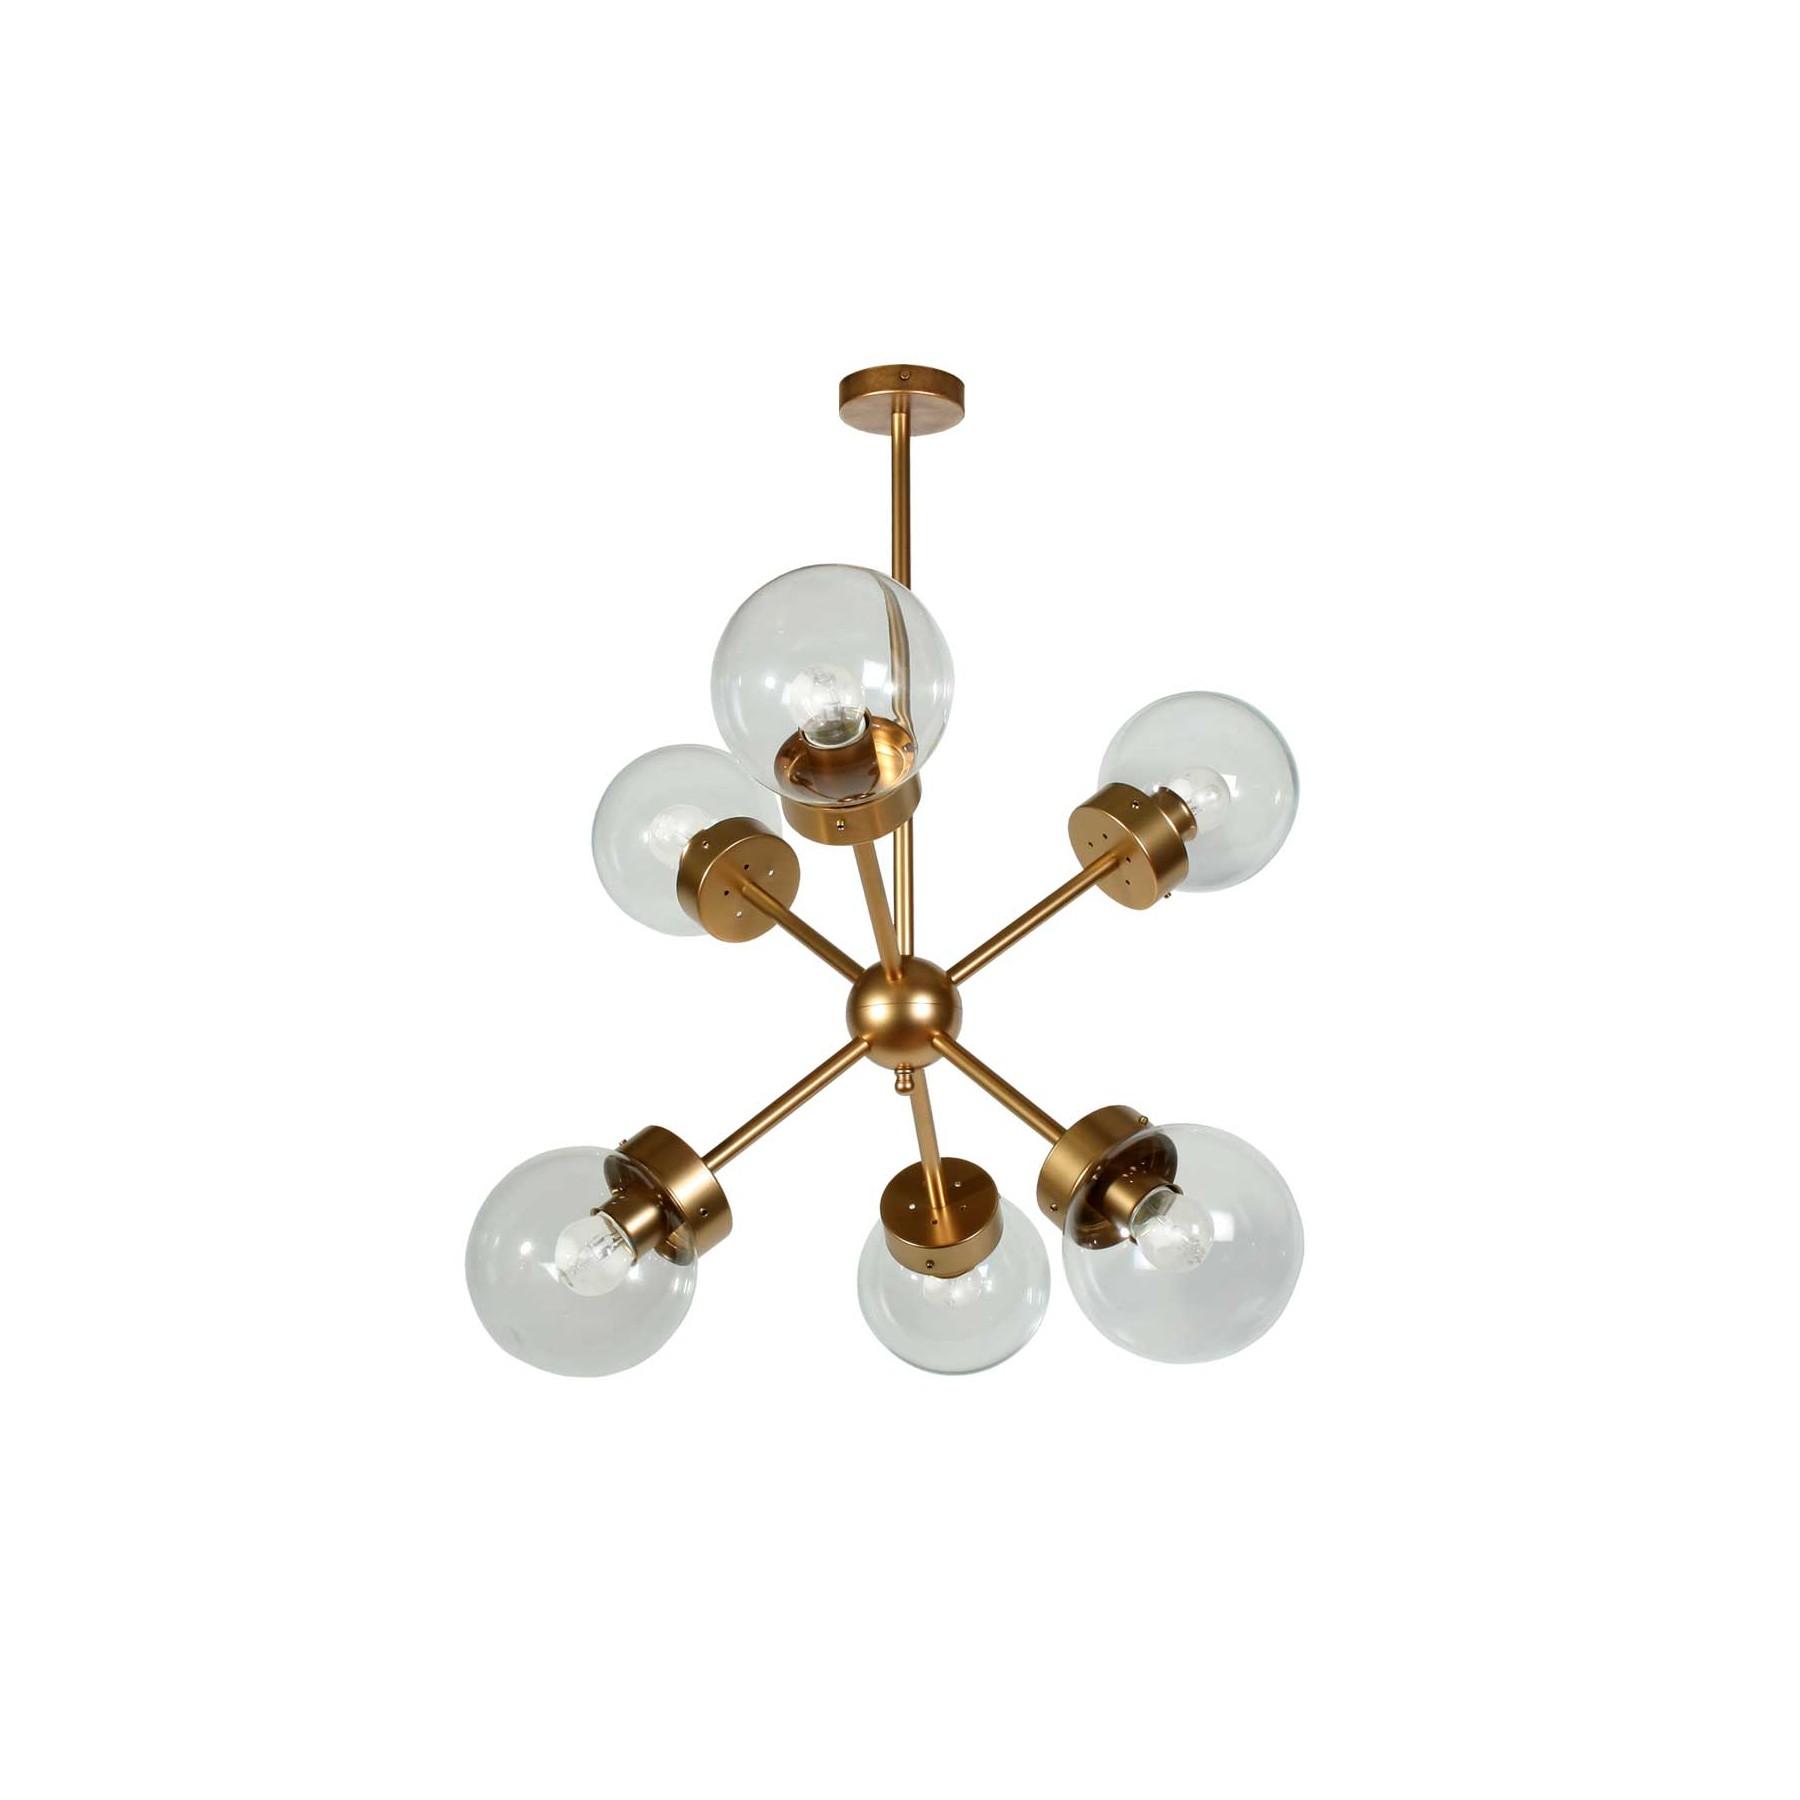 L mpara de techo colgante metal modelo visums for Modelos de lamparas